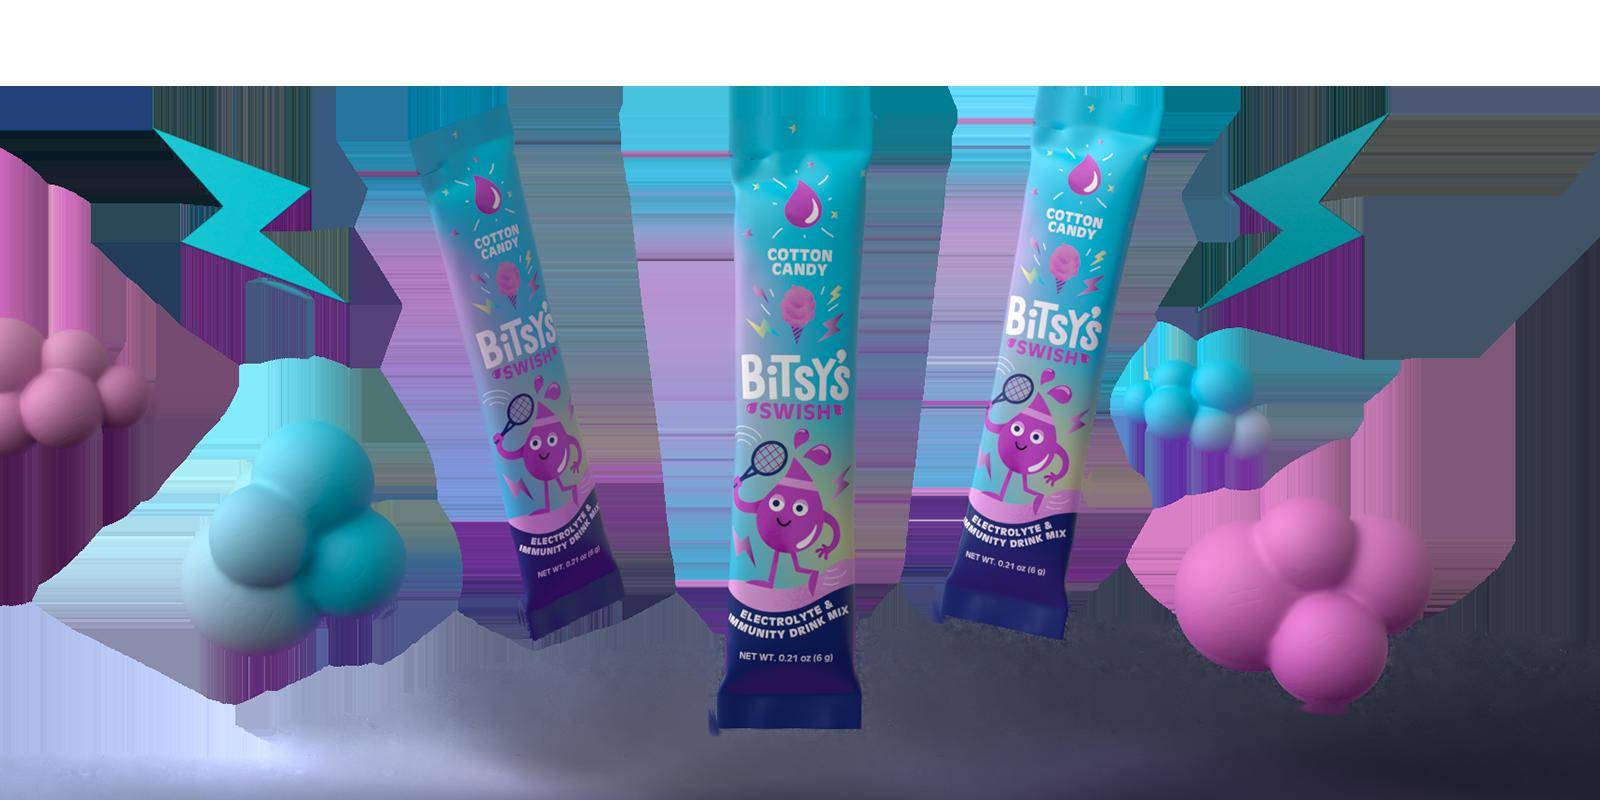 Bitsy's Swish Cotton Candy